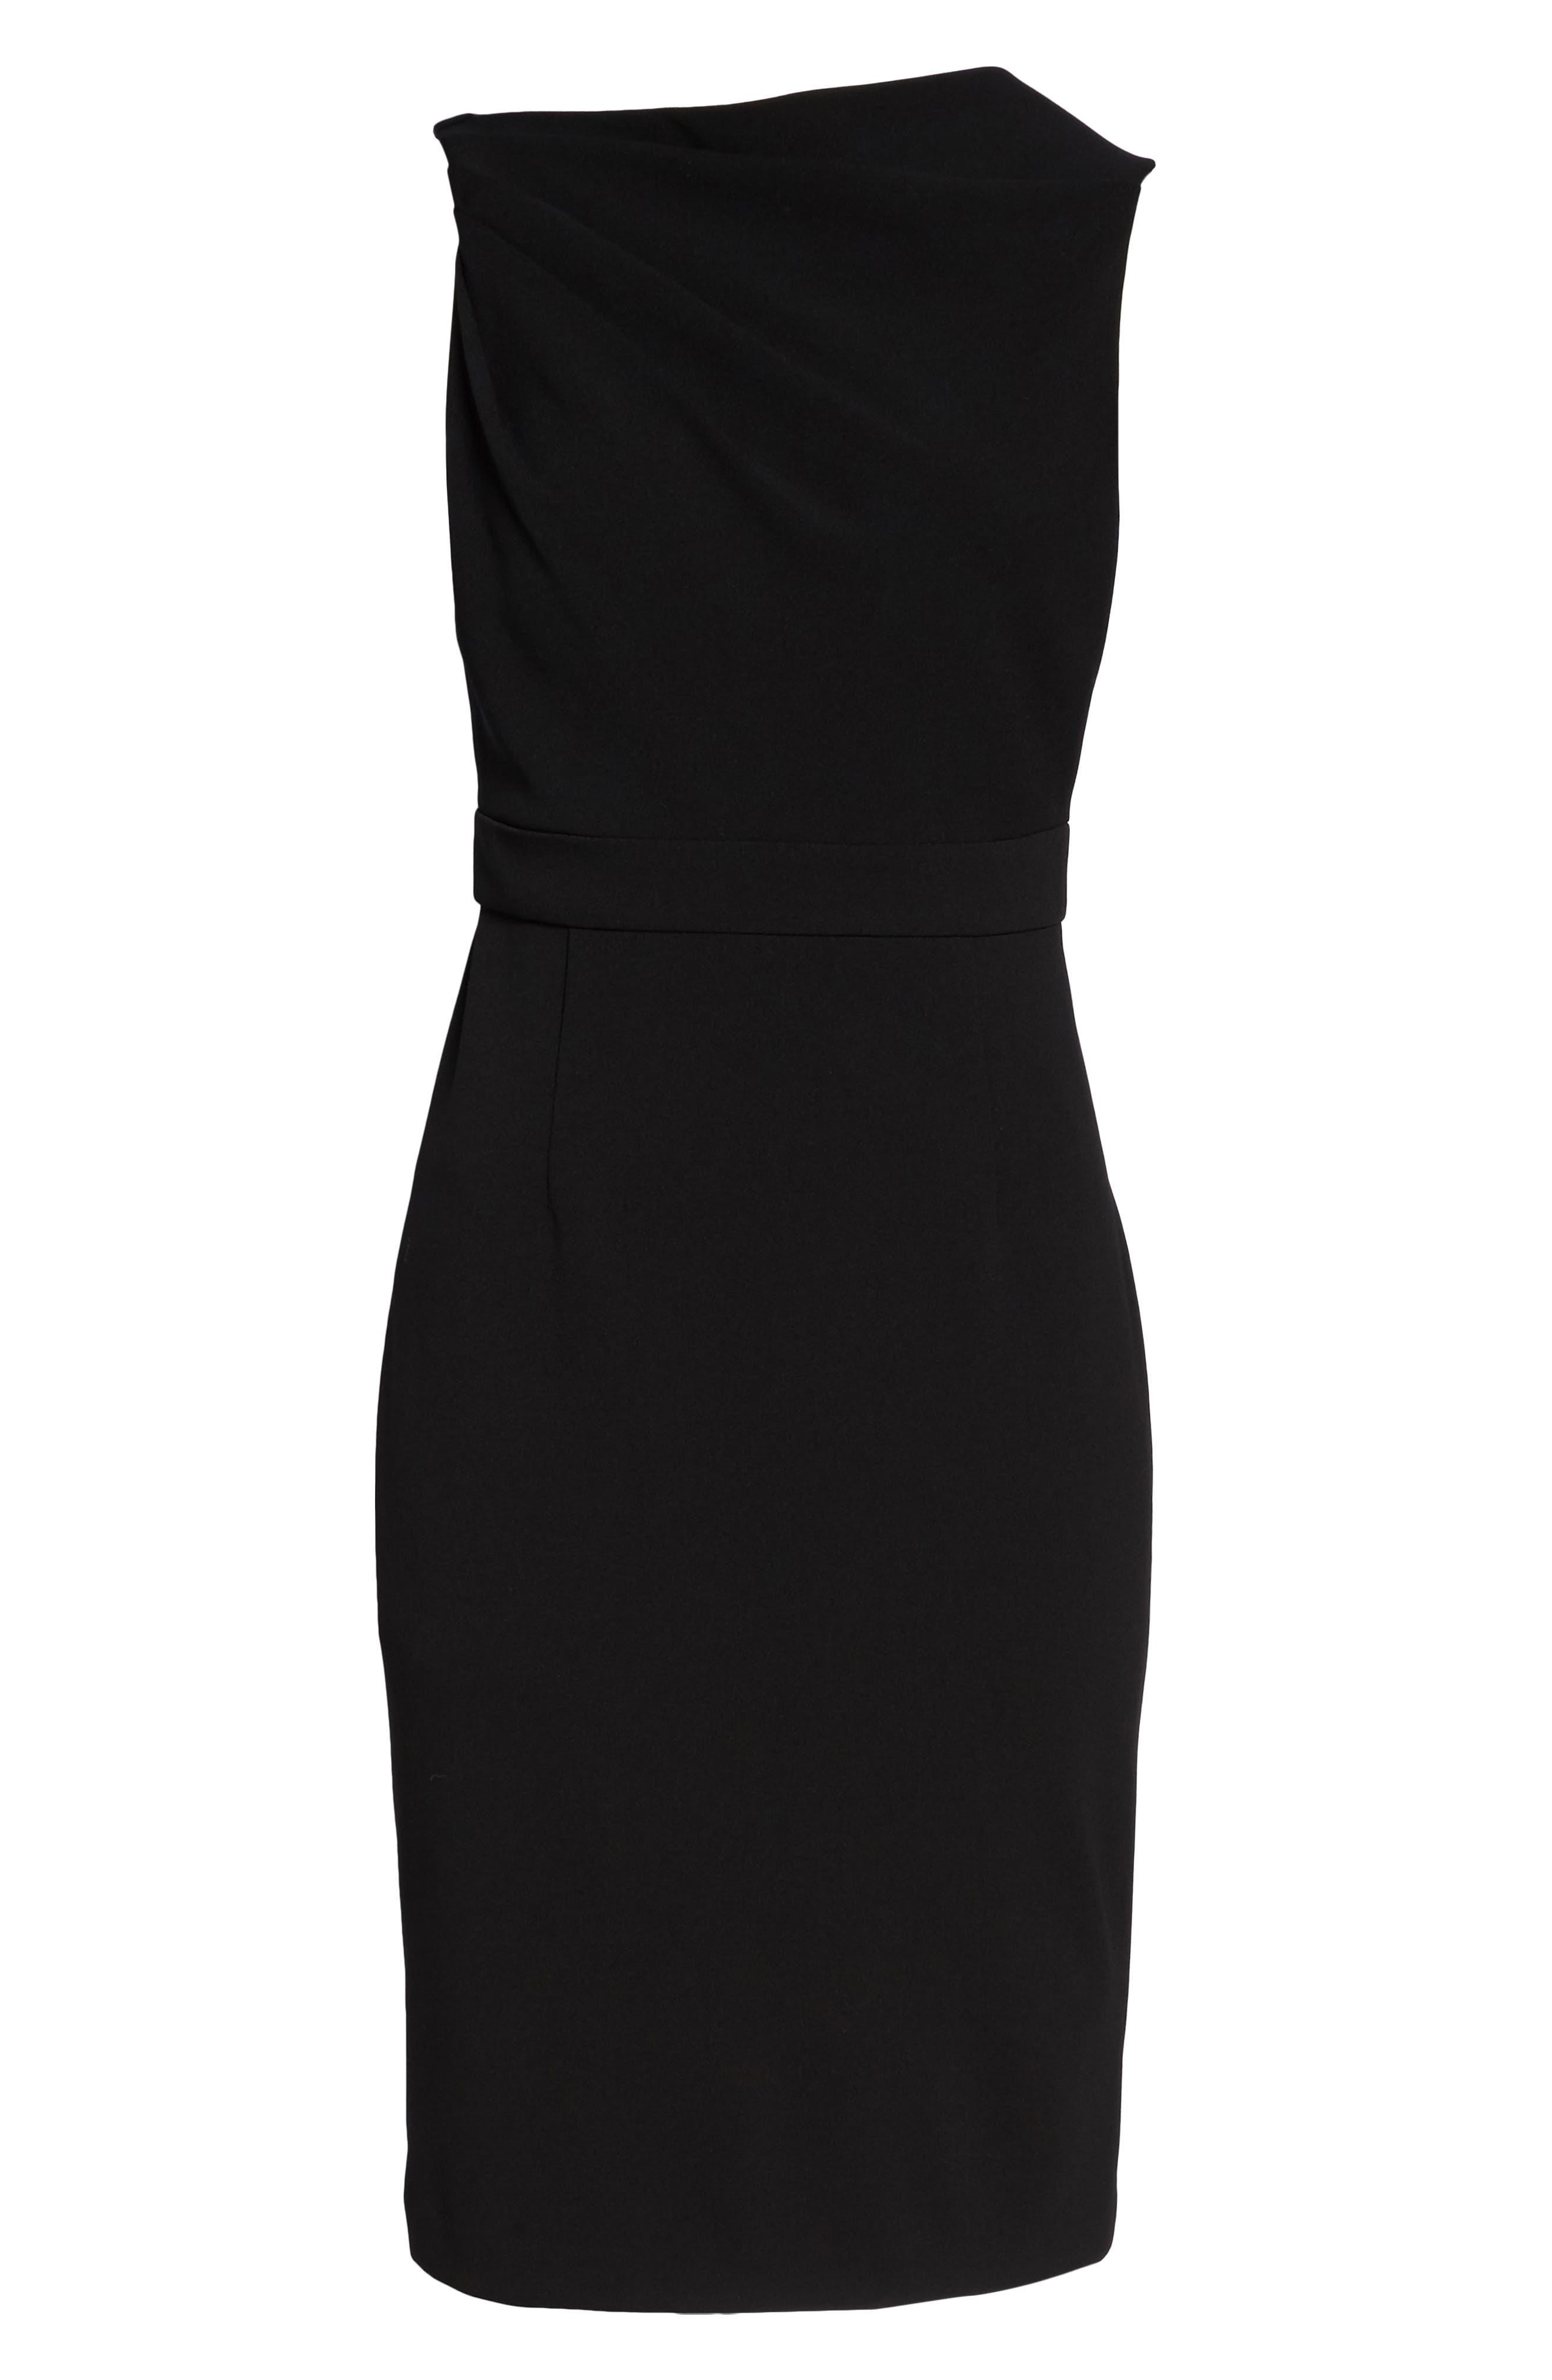 High Neck Sheath Dress,                             Alternate thumbnail 7, color,                             Black